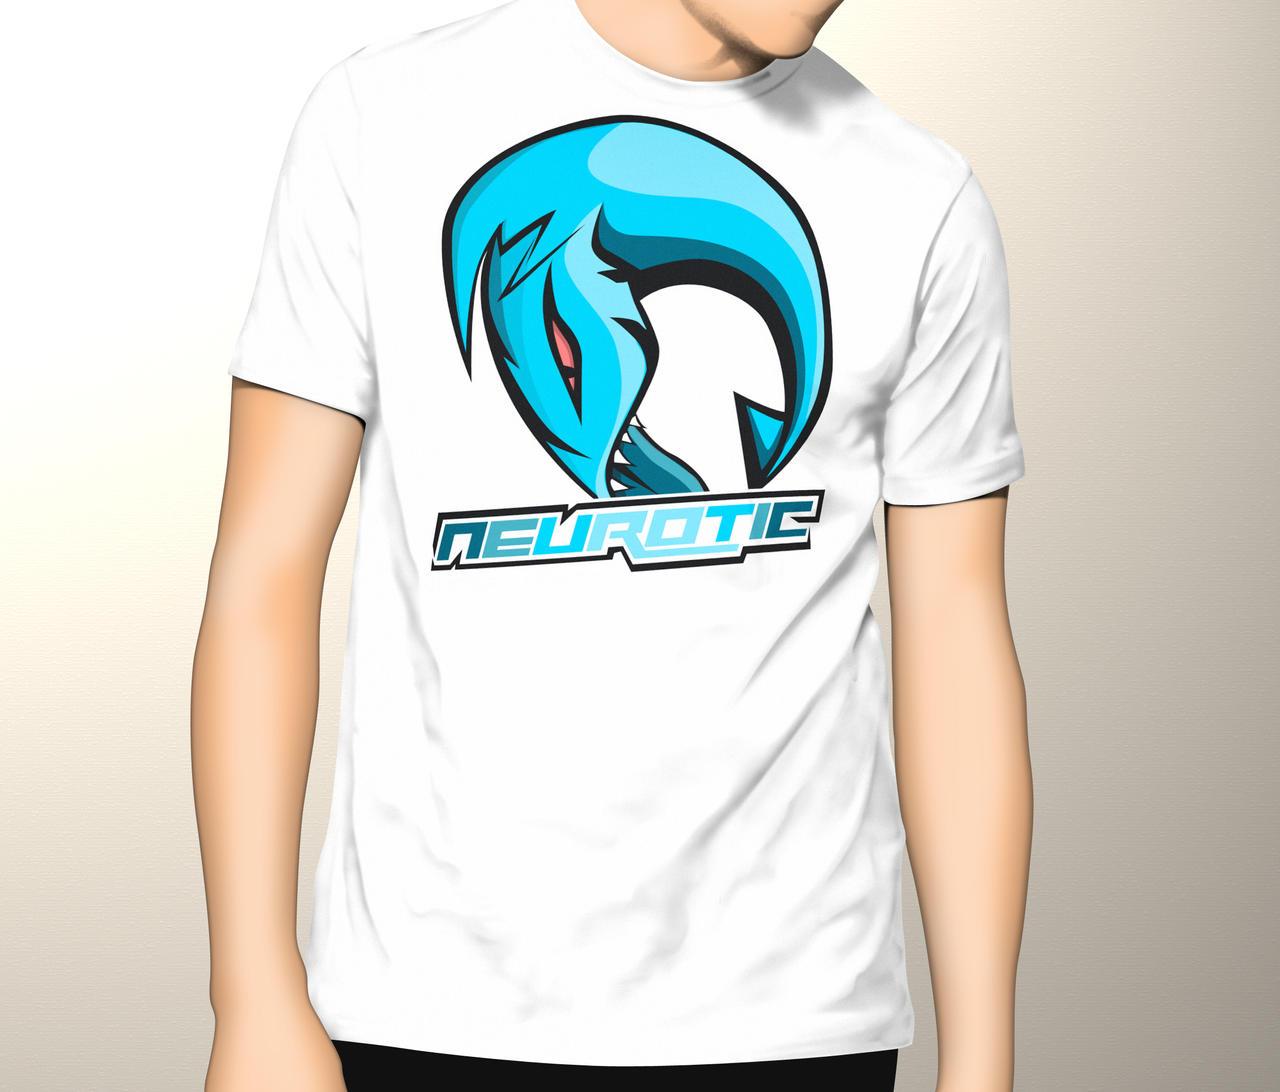 Shirt design games - Shirt Design Games 63